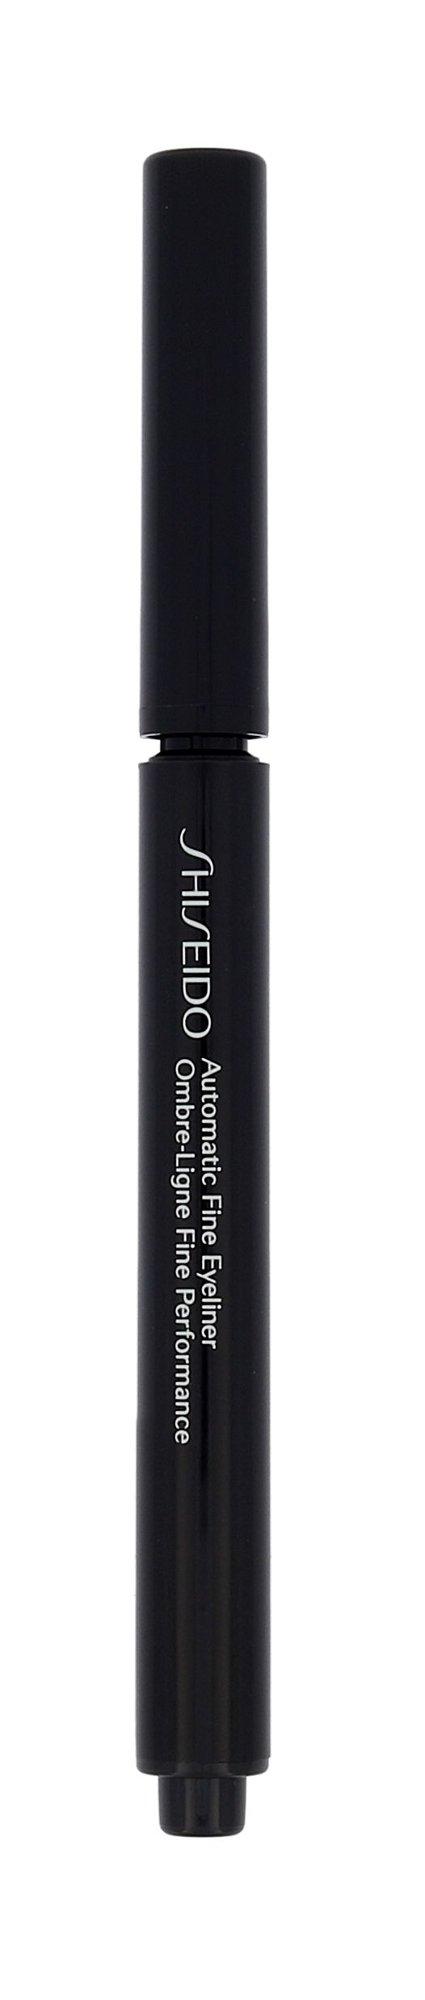 Shiseido Automatic Fine Eyeliner Cosmetic 1,4ml BK901 Black